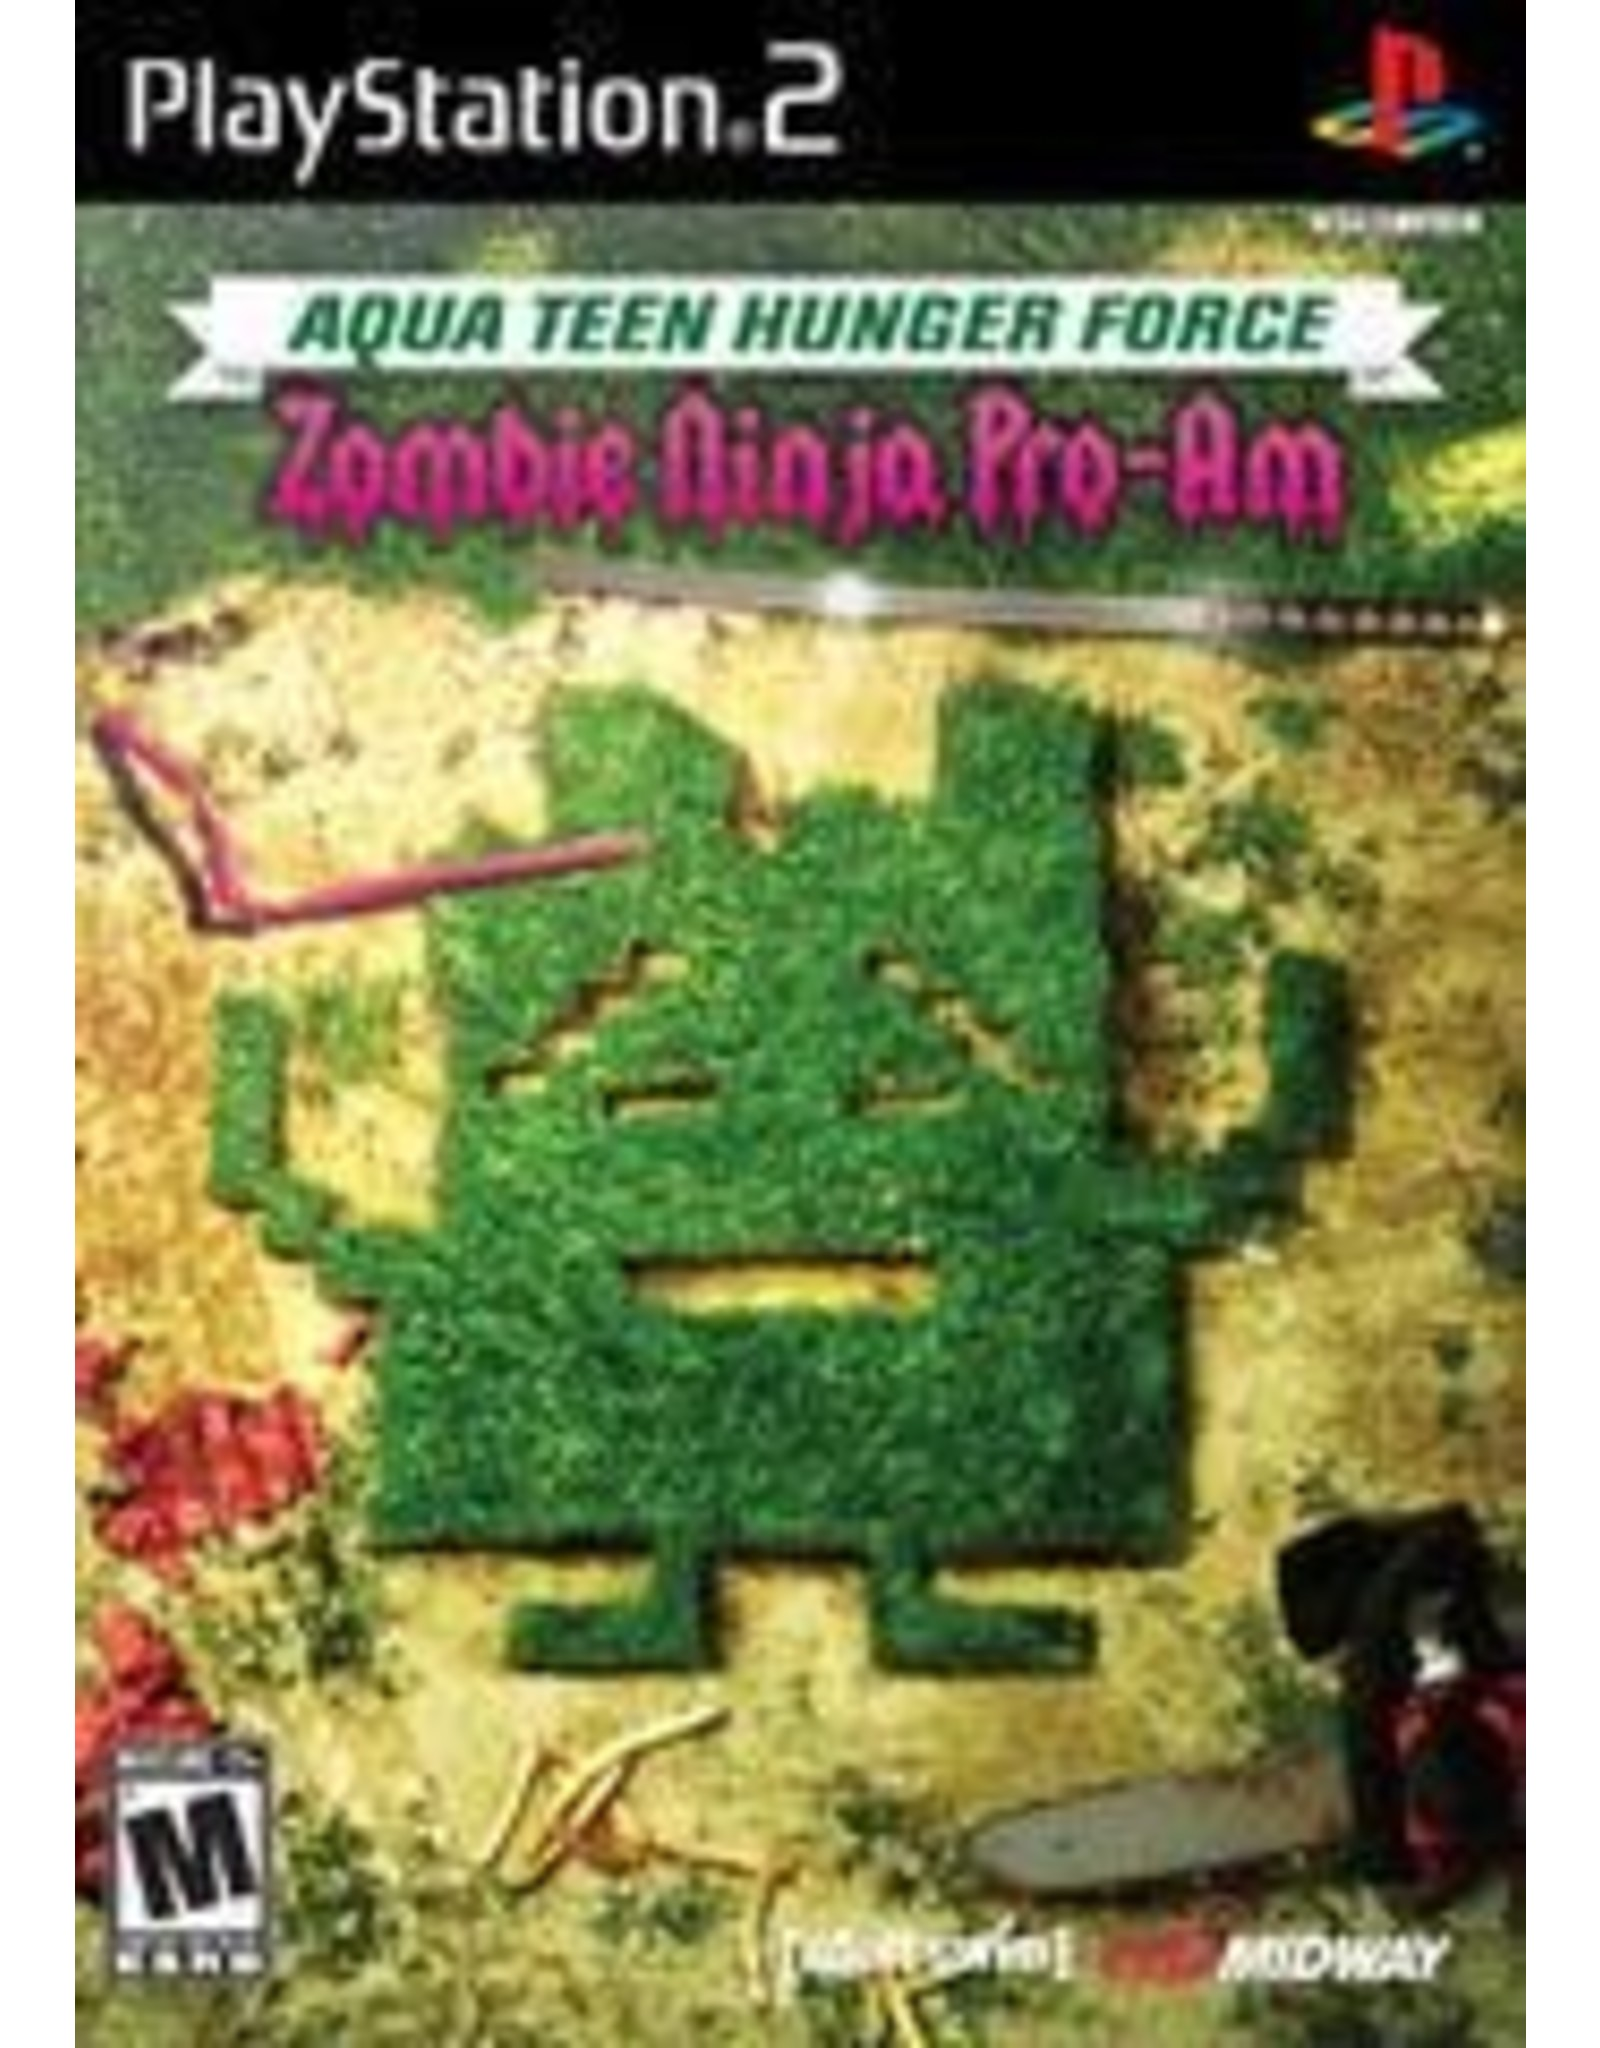 Playstation 2 Aqua Teen Hunger Force Zombie Ninja Pro-Am (CiB)